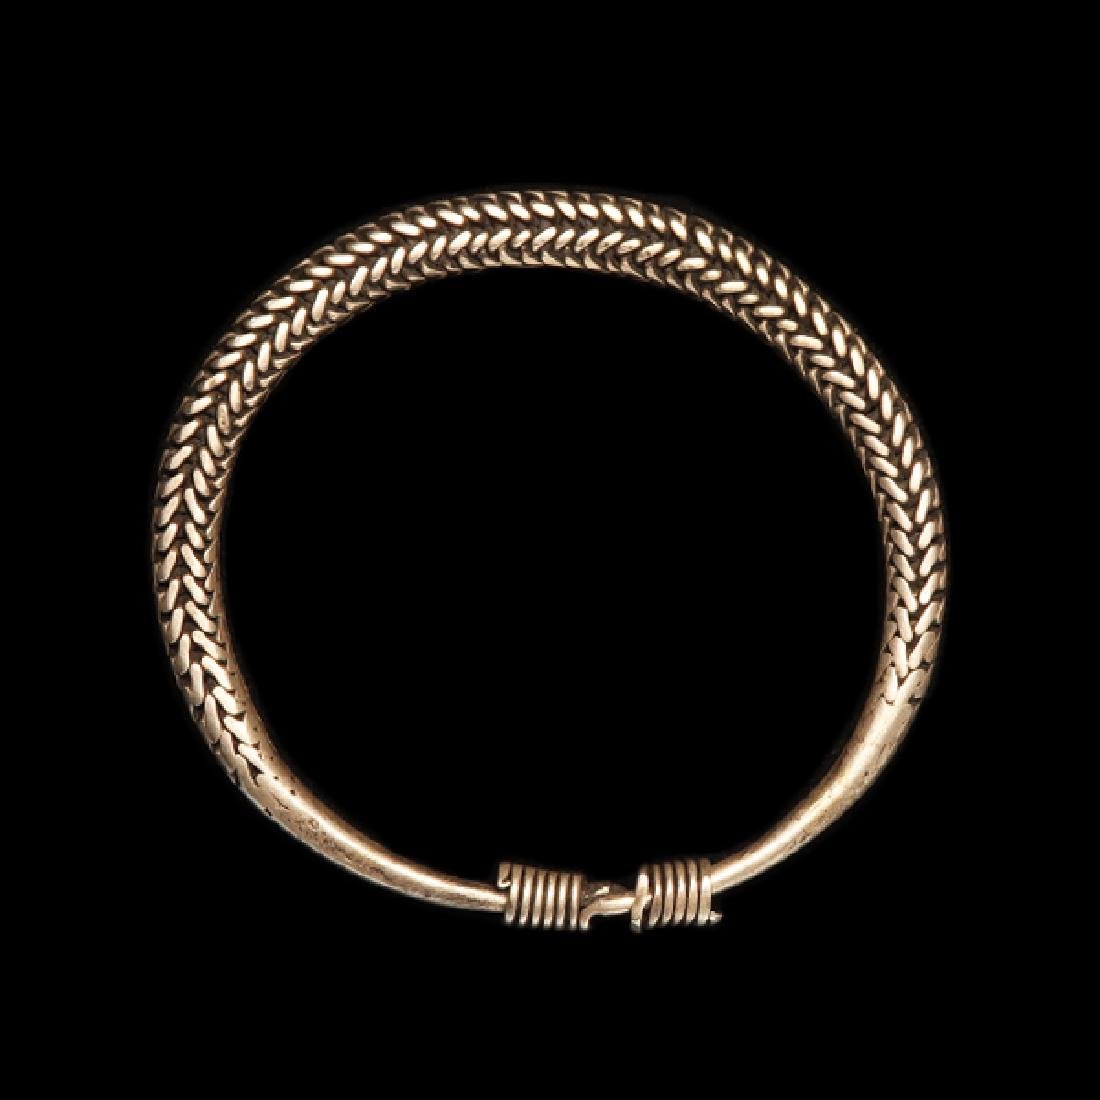 Medieval Viking Silver Bracelet, 8 cm. D. Flexible